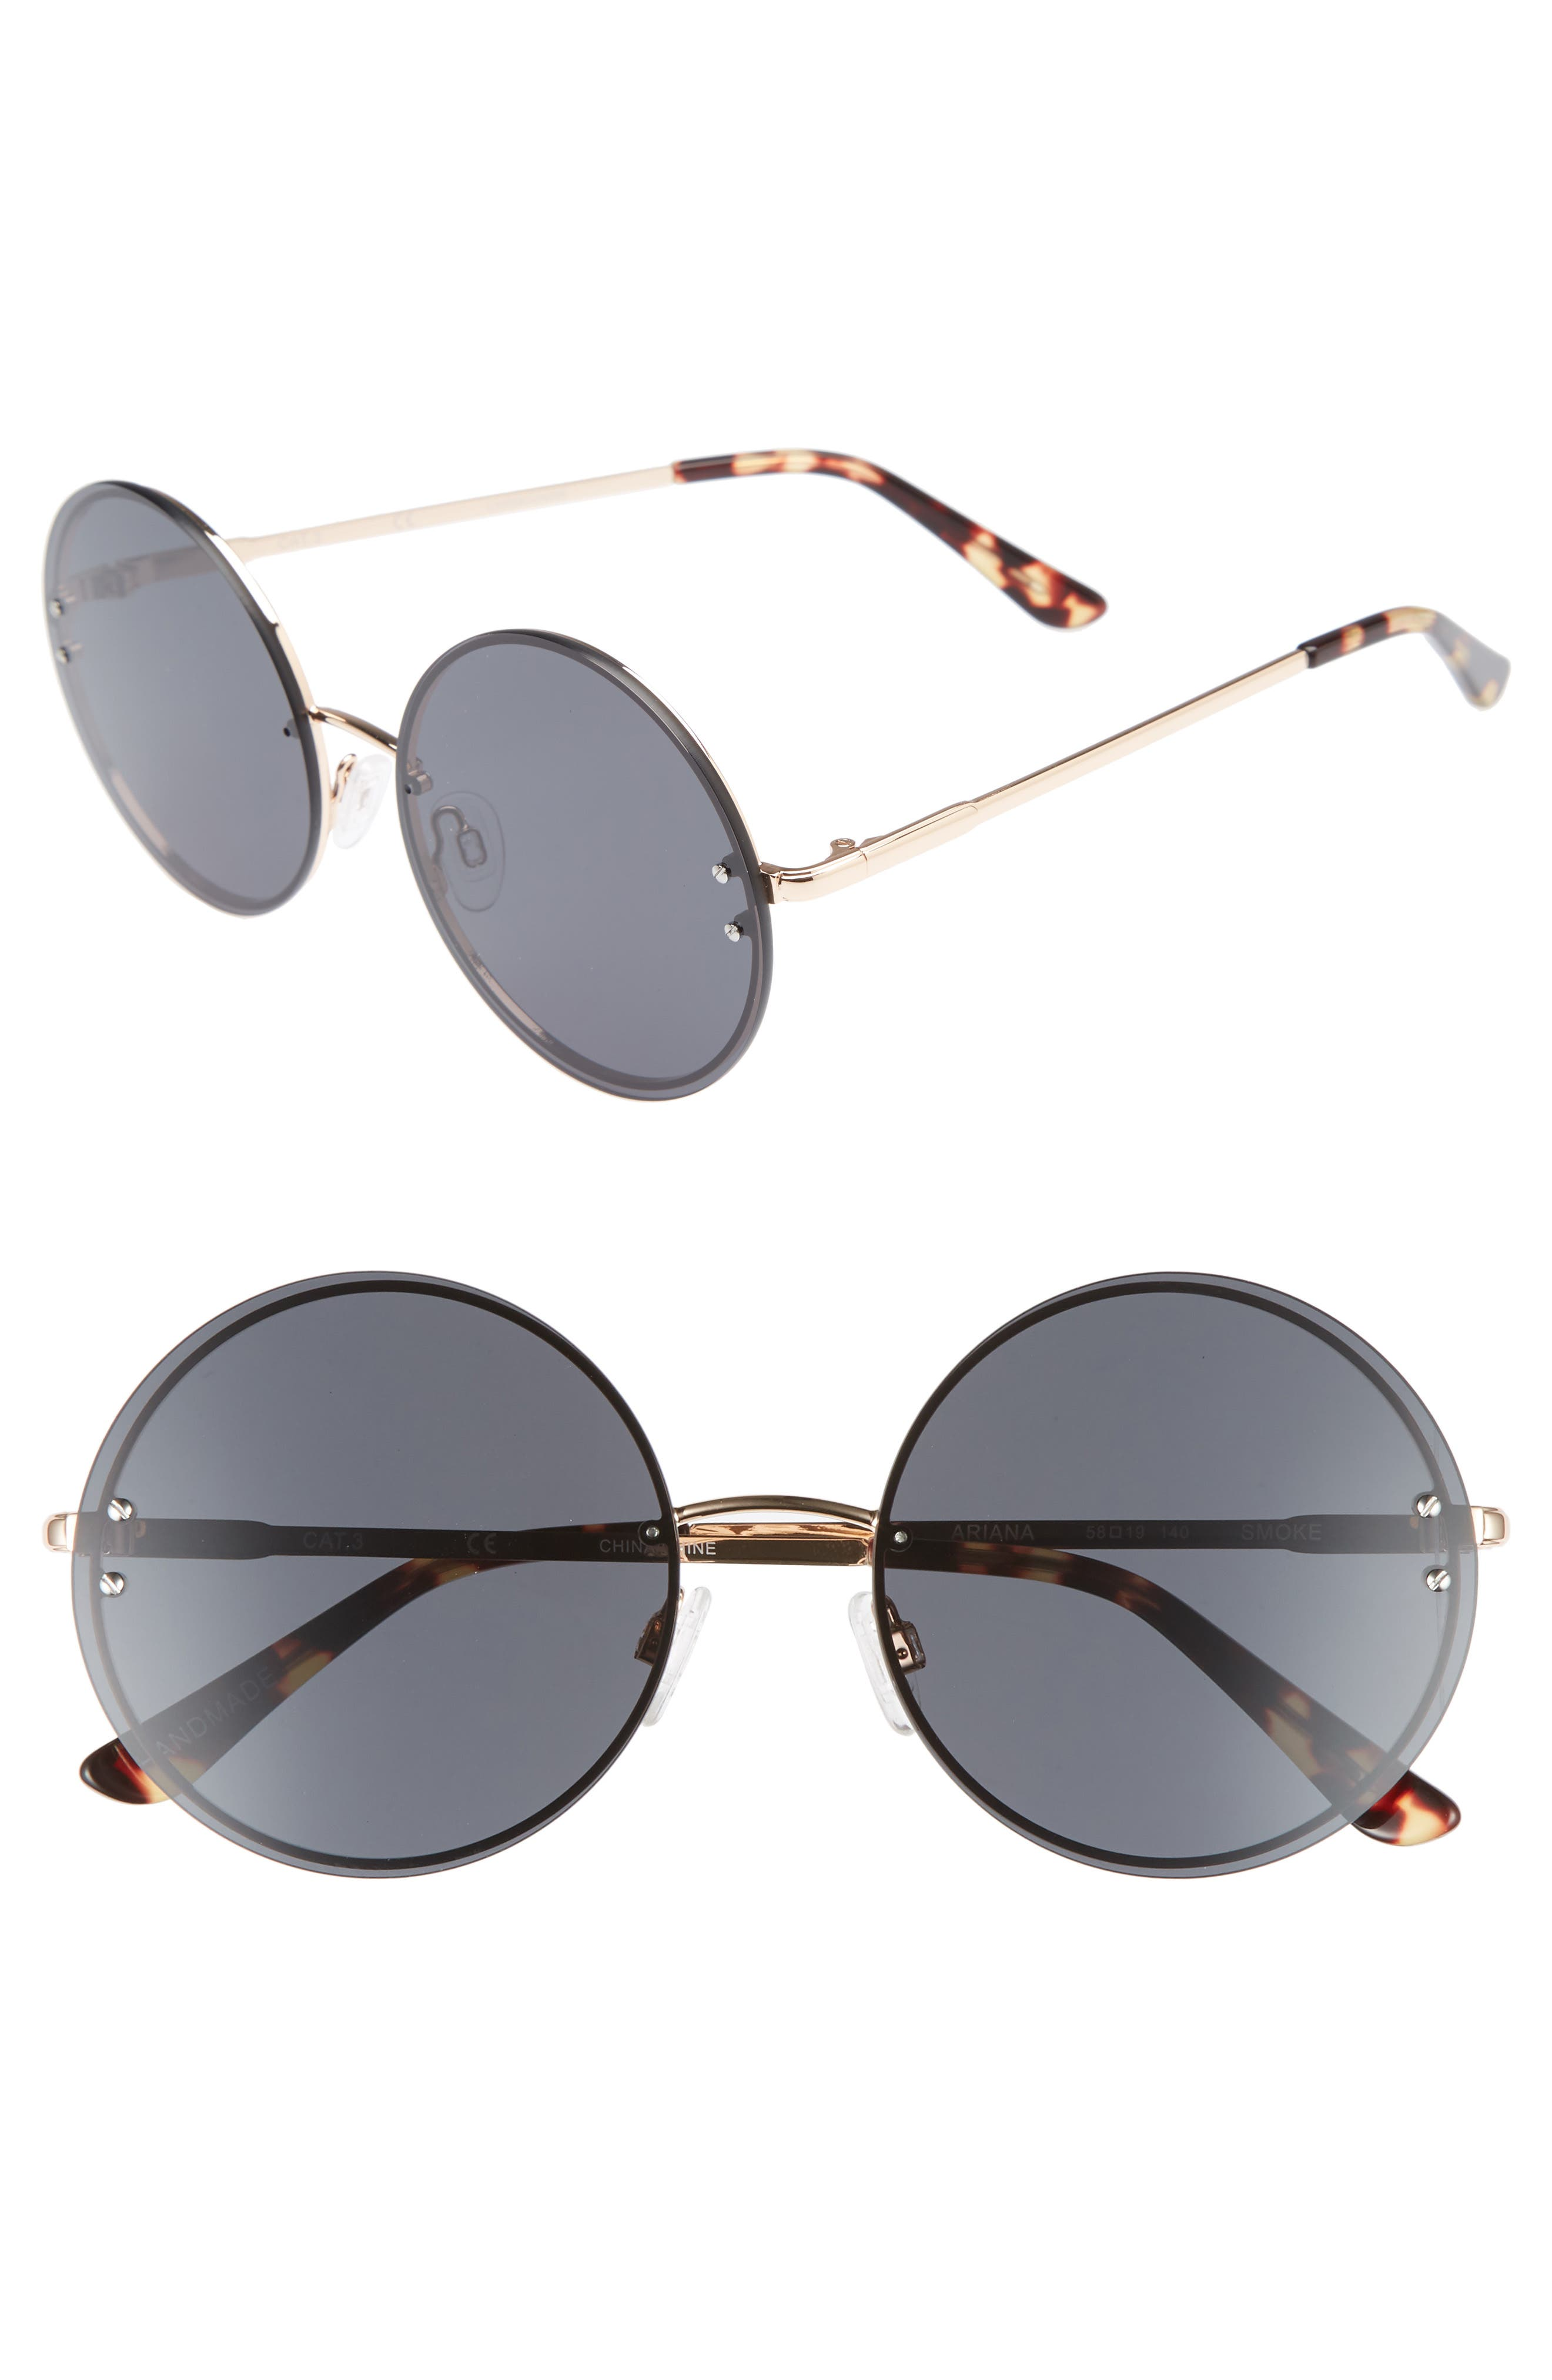 Ariana 58mm Round Sunglasses,                         Main,                         color, SOLID SMOKE